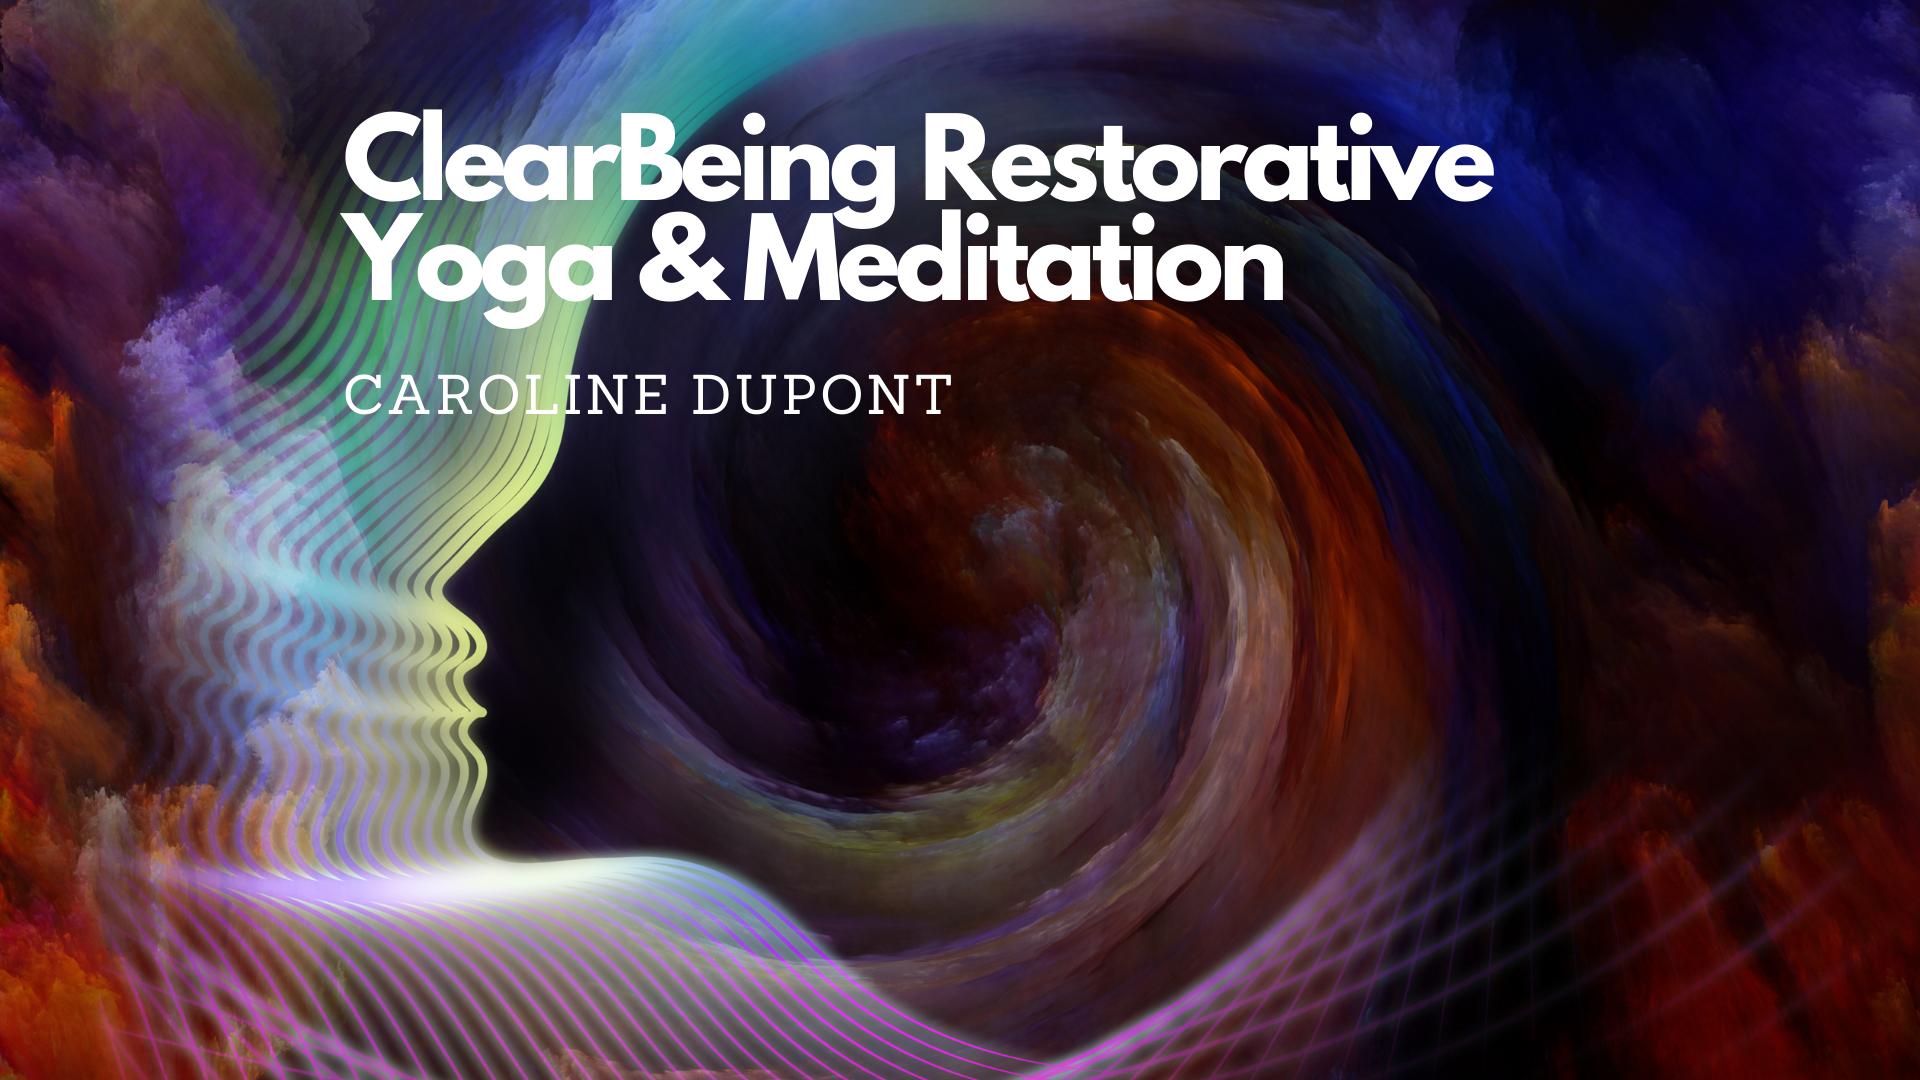 ClearBeing Restorative Yoga & Meditation